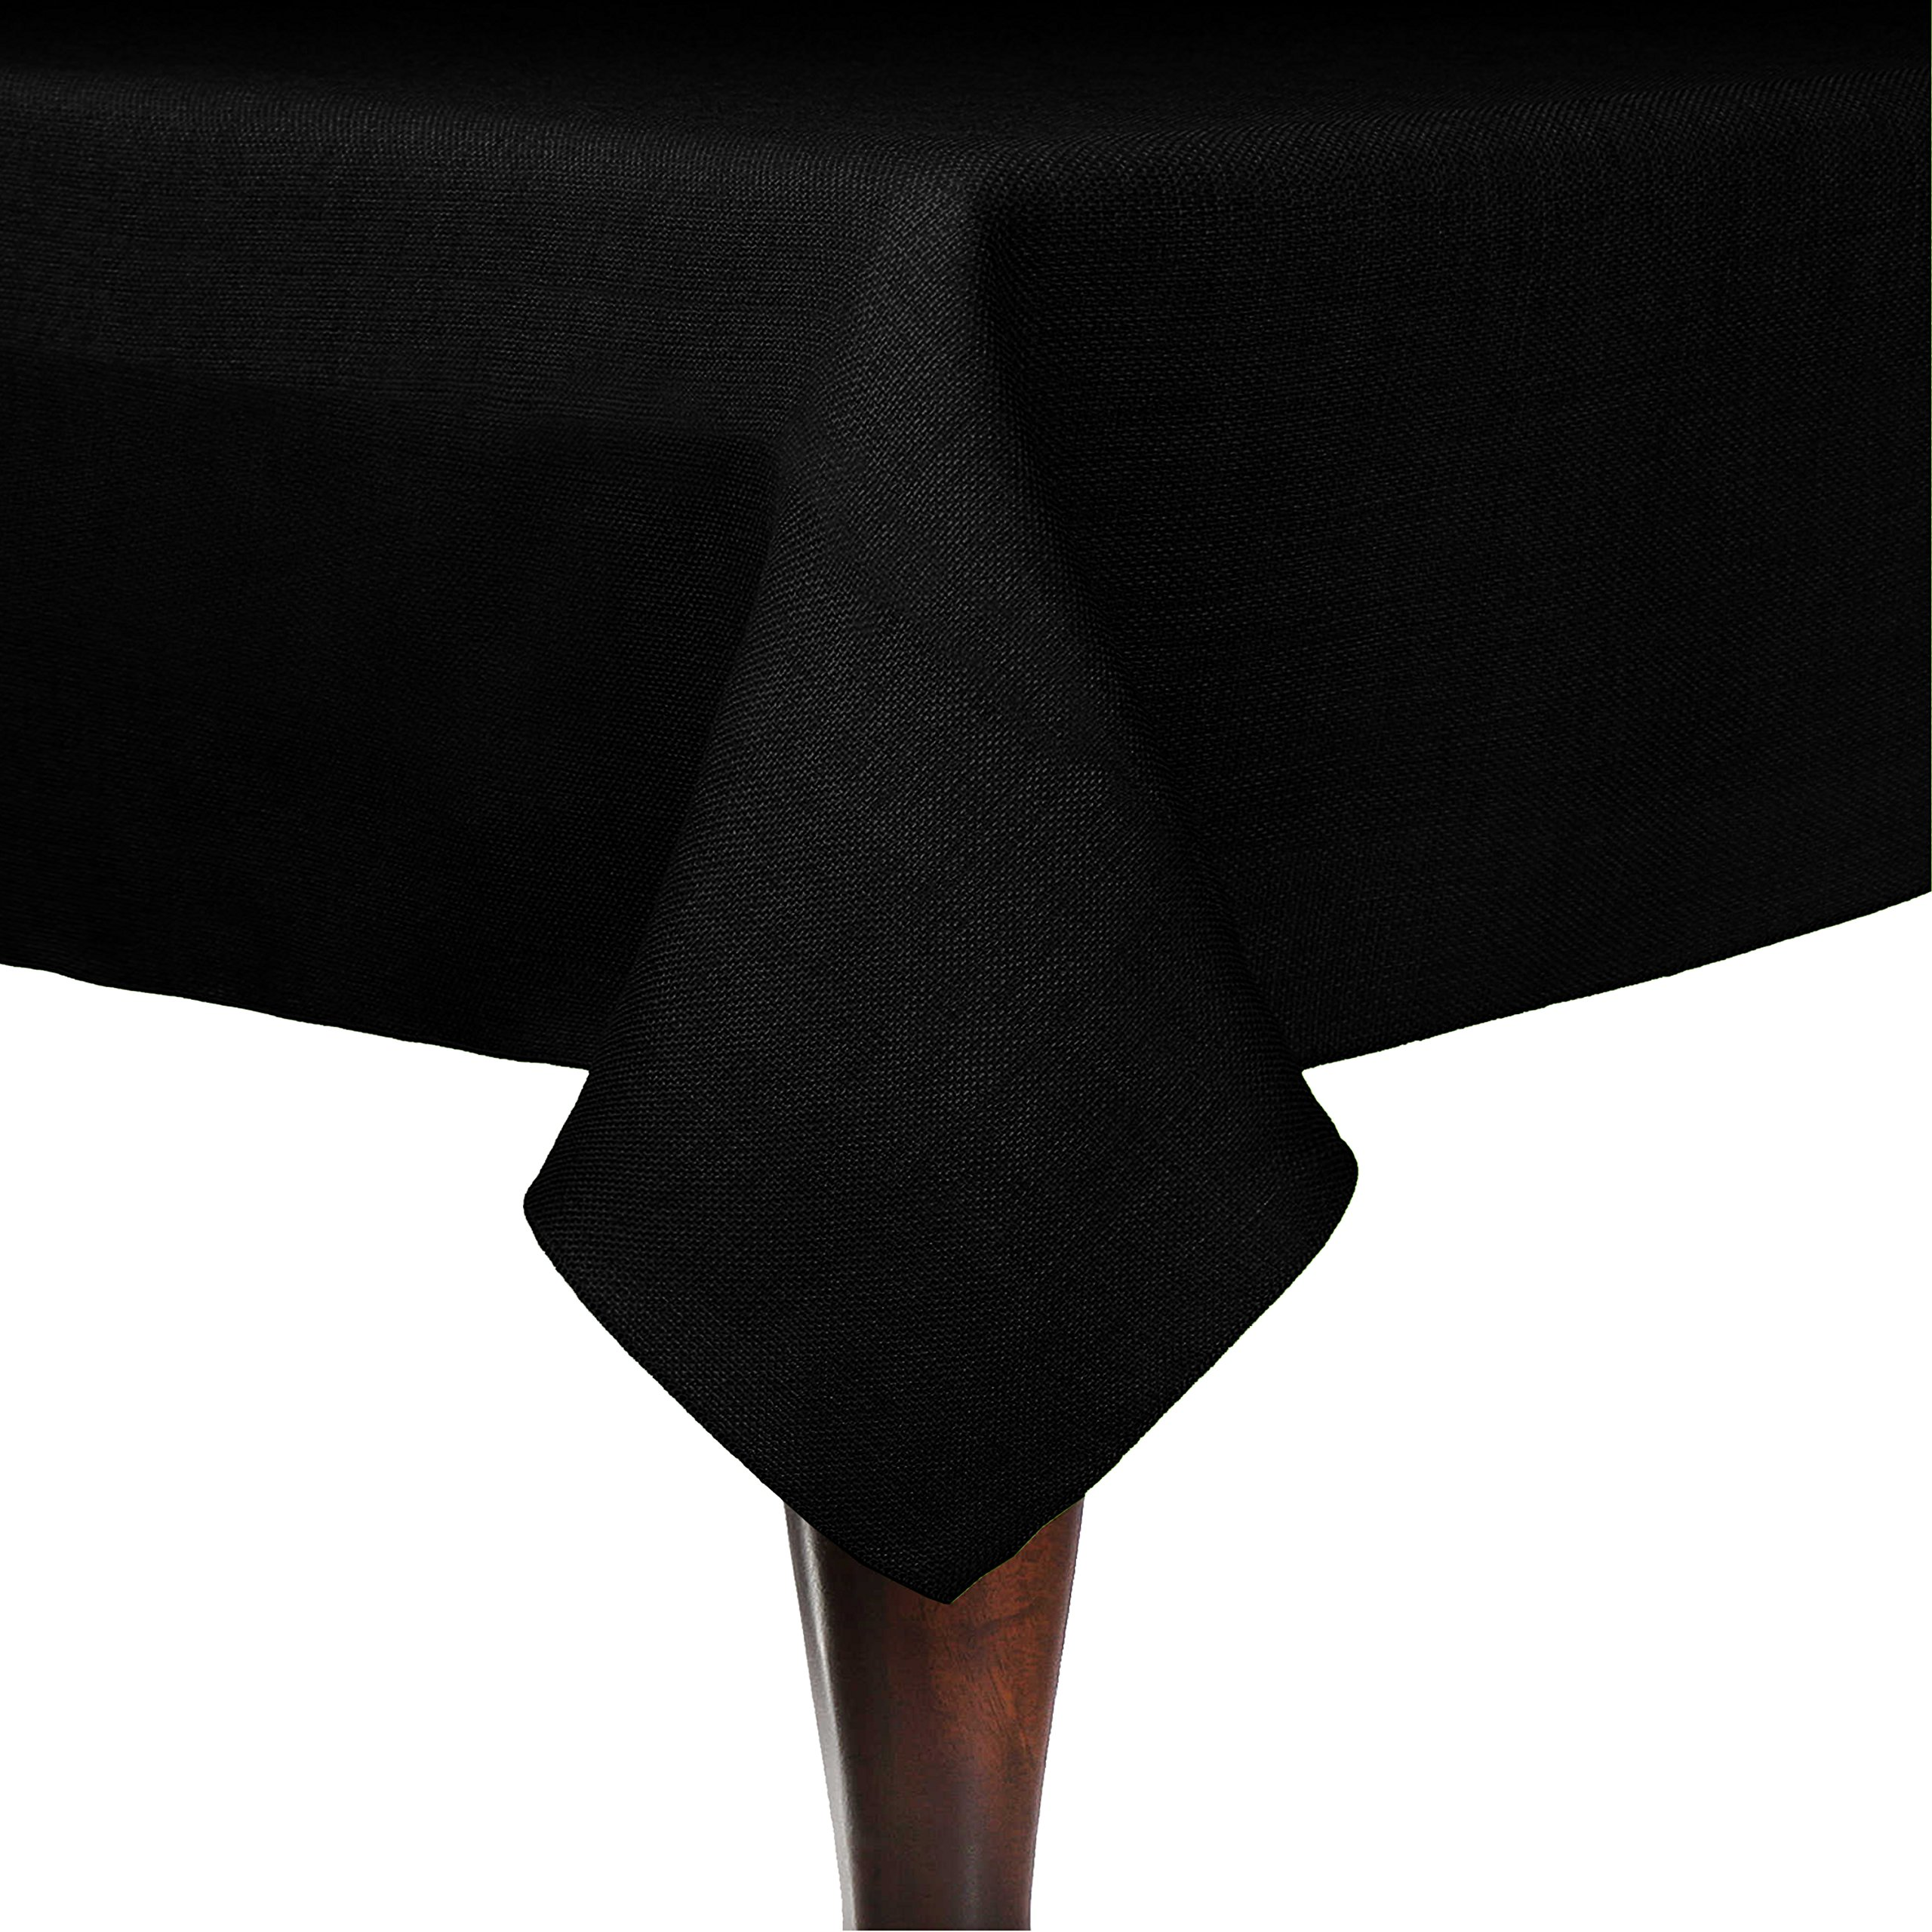 Ultimate Textile (3 Pack) Faux Burlap - Havana 60 x 120-Inch Rectangular Tablecloth - Basket Weave, Black